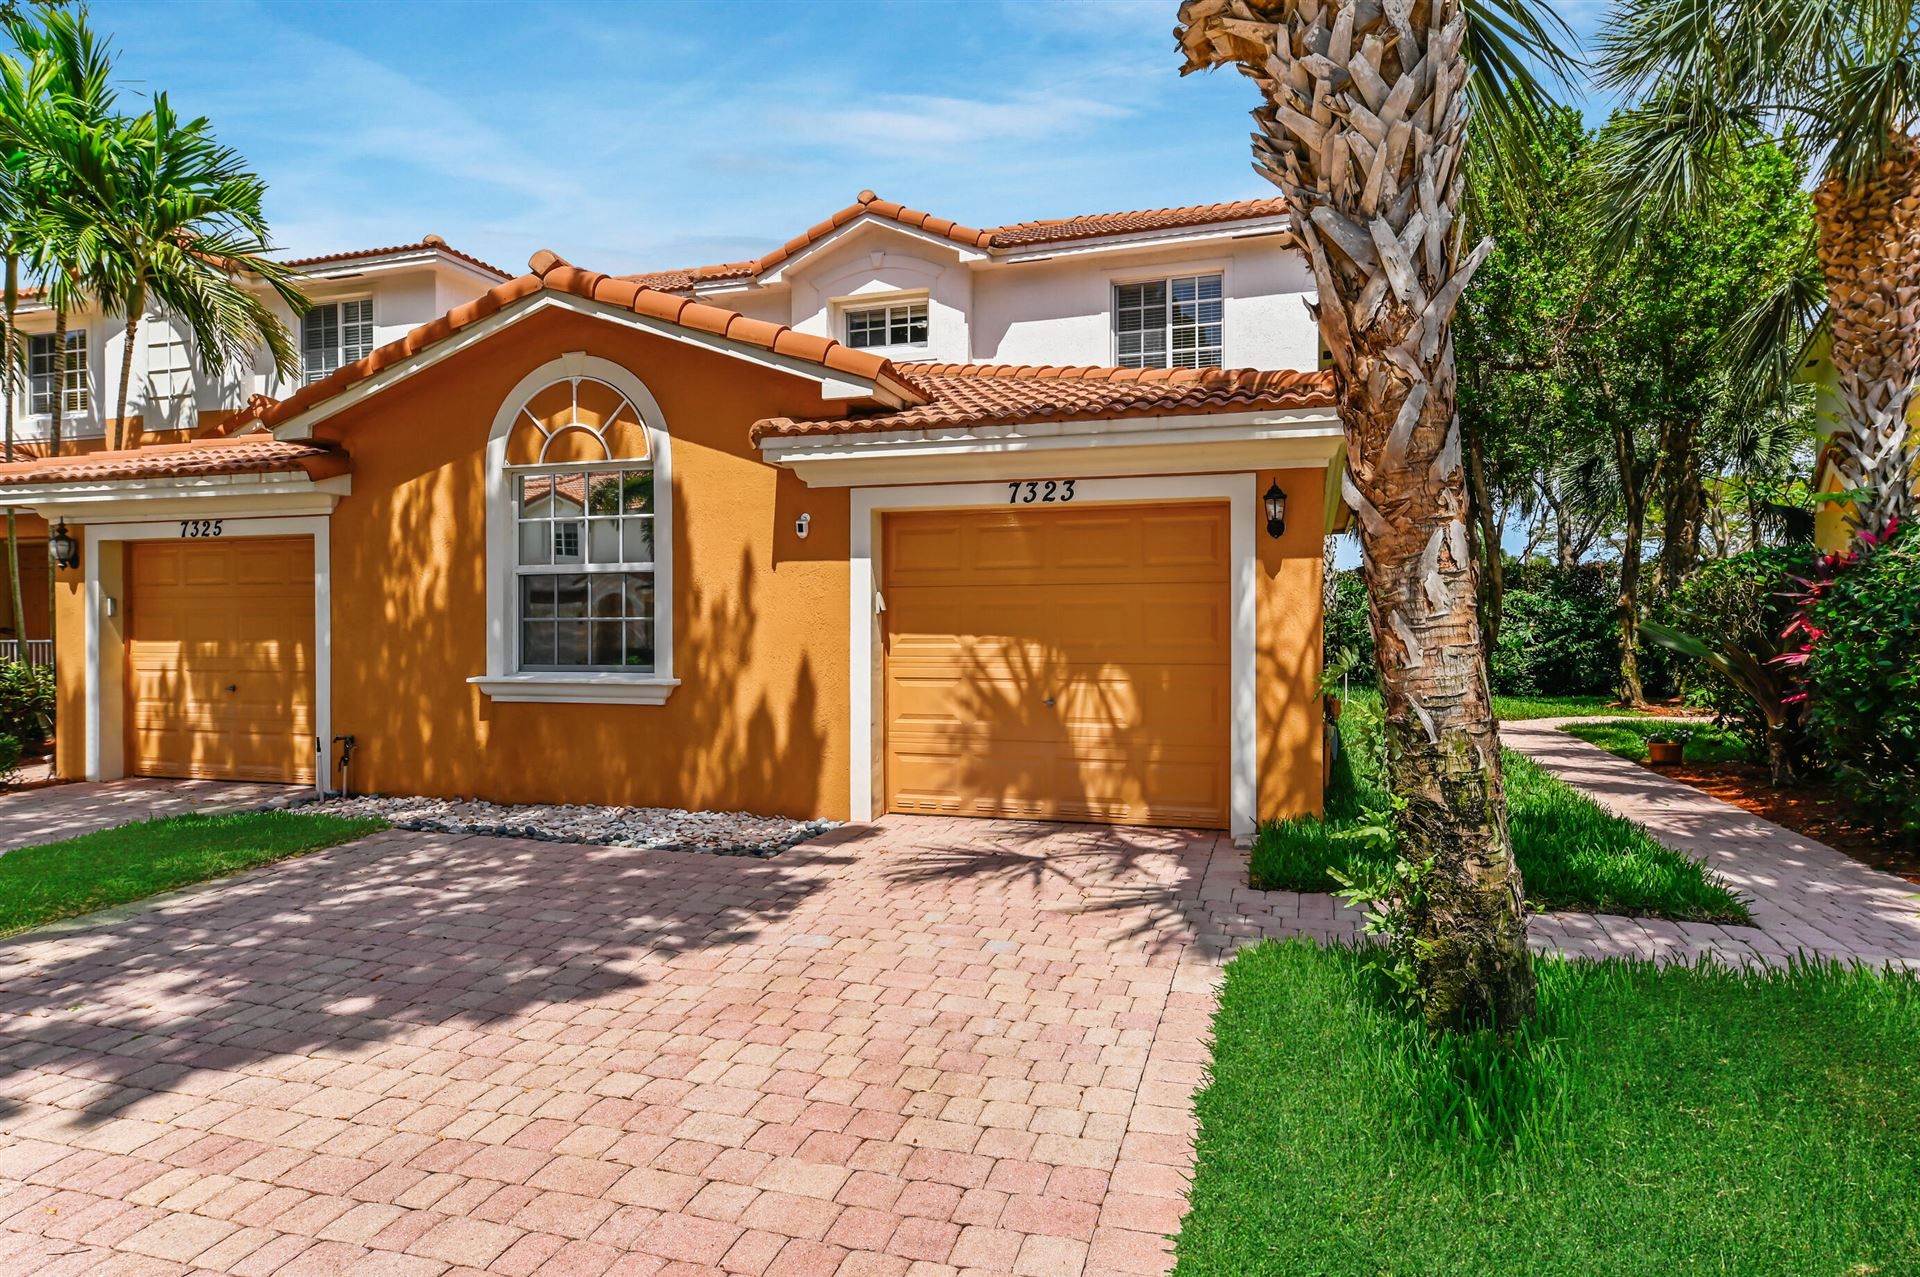 7323 Briella Drive, Boynton Beach, FL 33437 - MLS#: RX-10712774